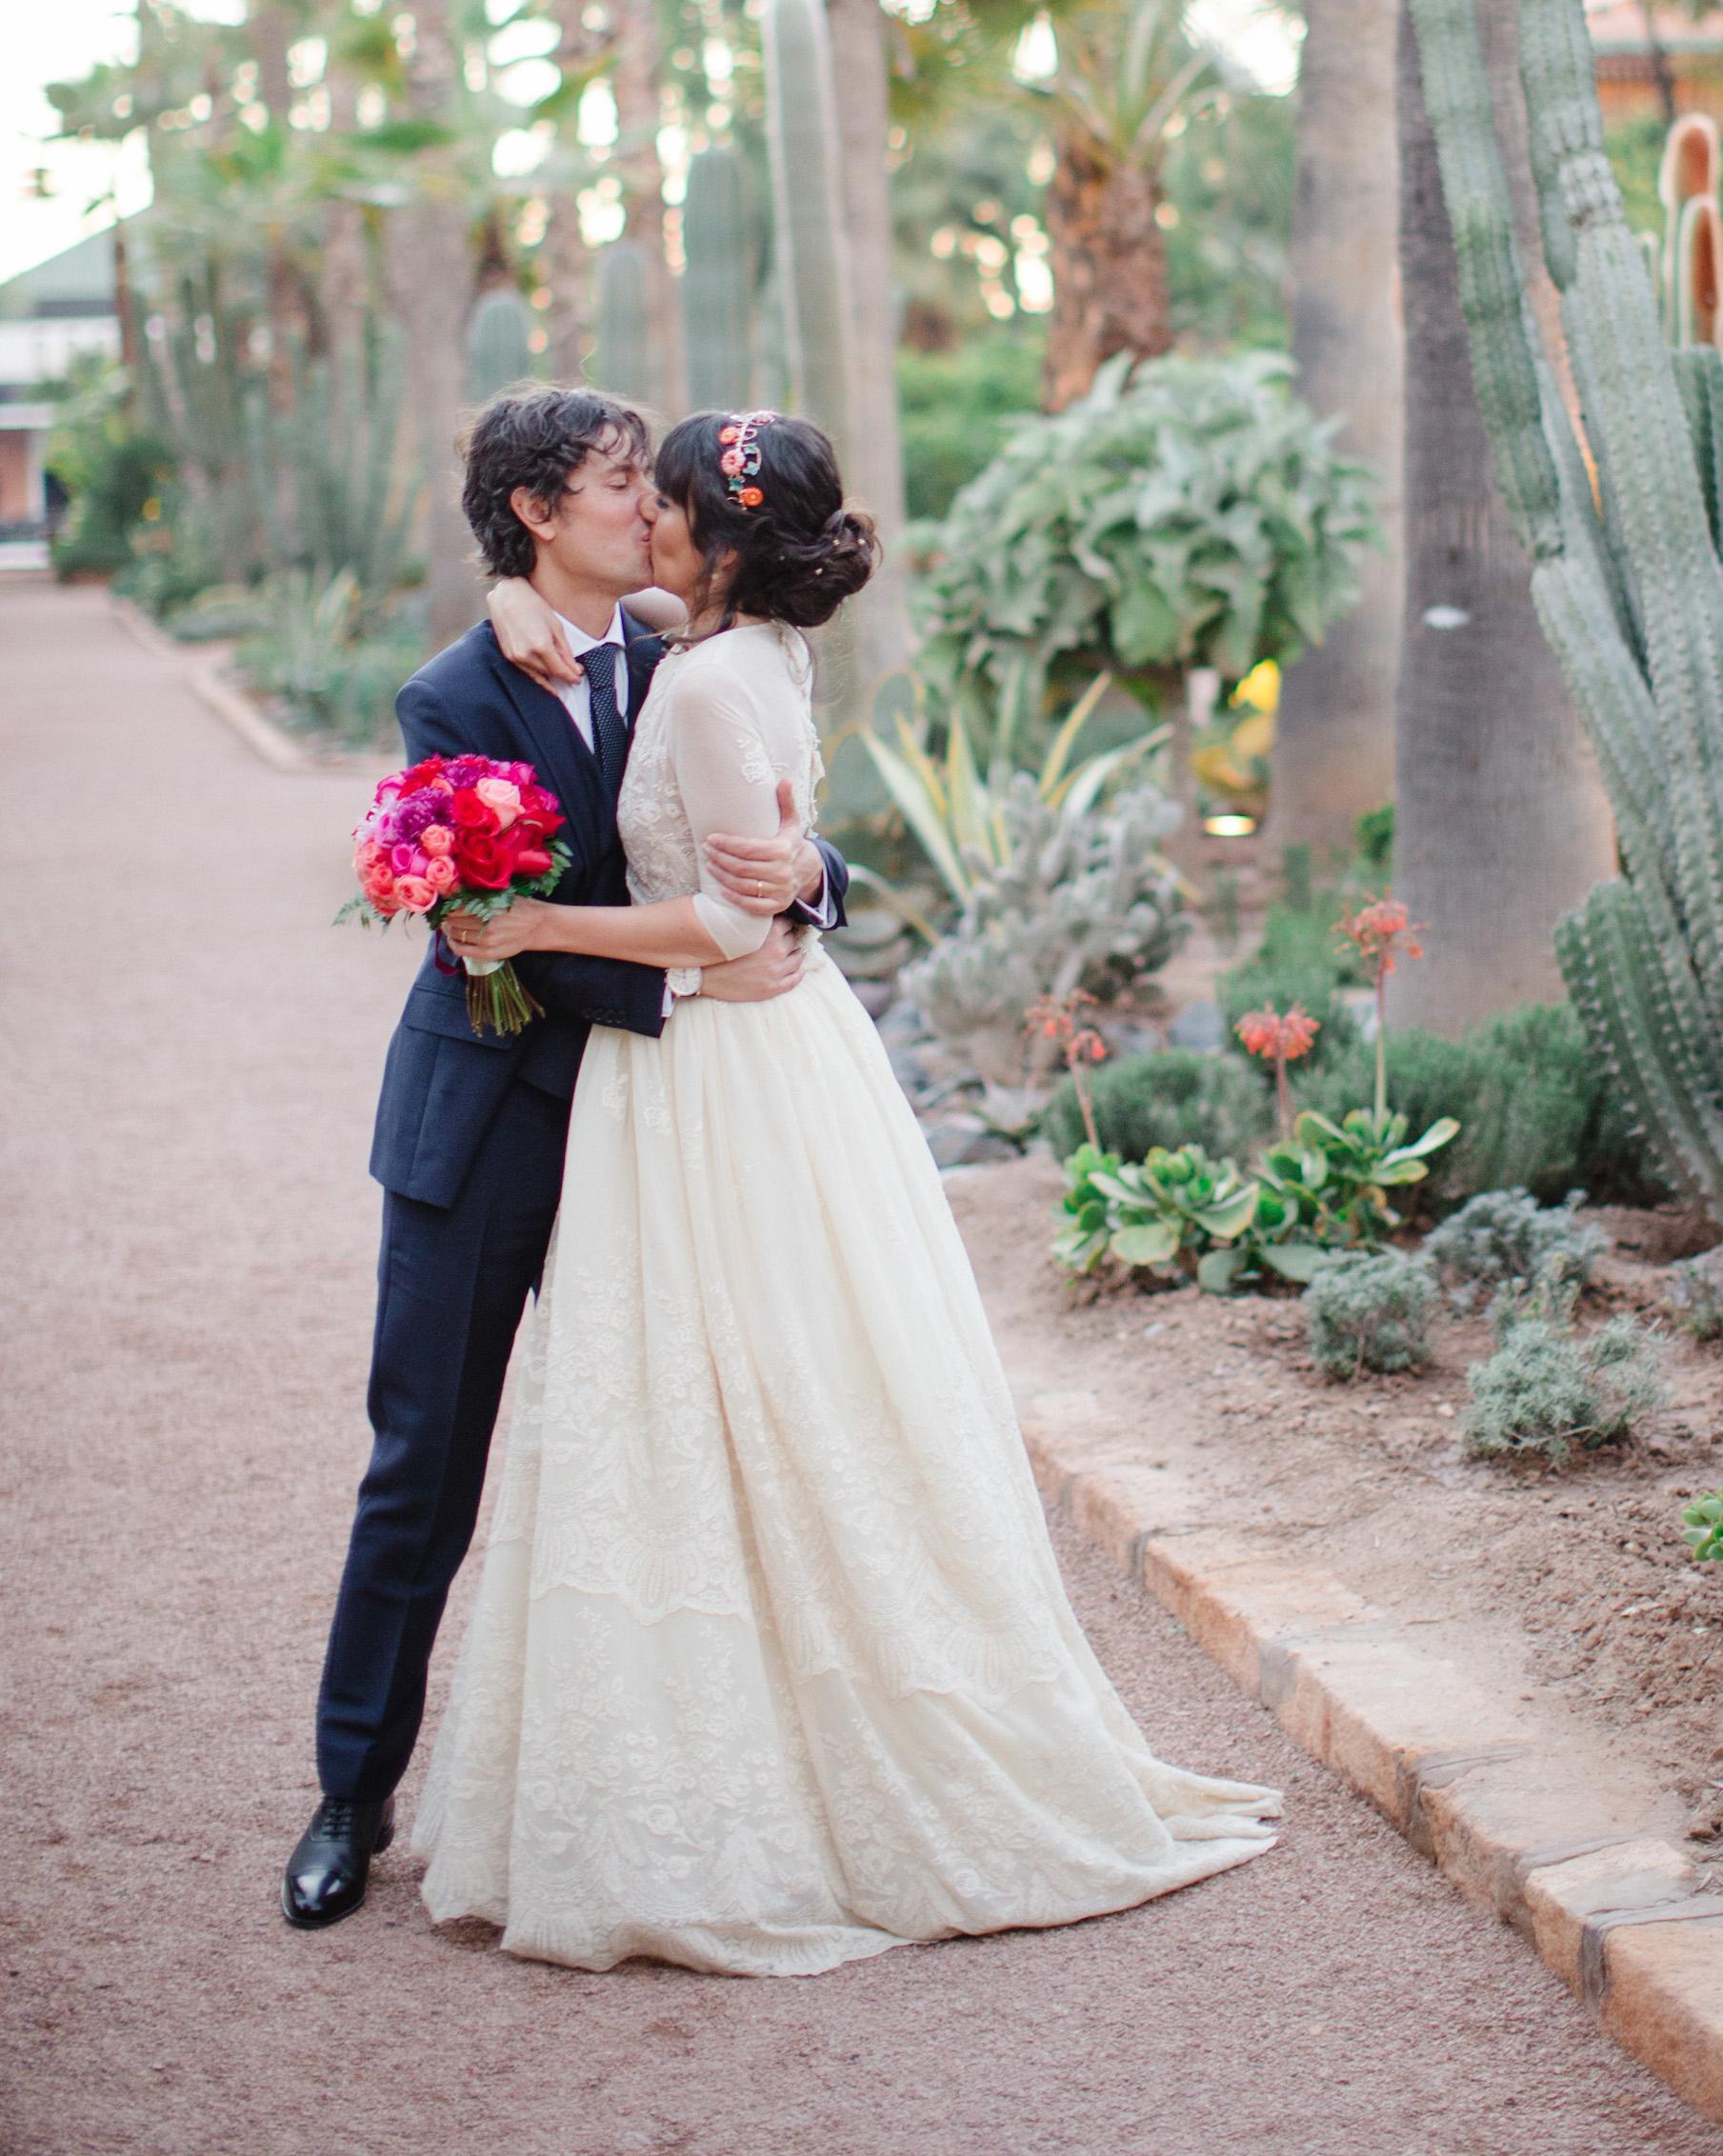 federica-tommaso-wedding-couple-094-s112330-1015.jpg